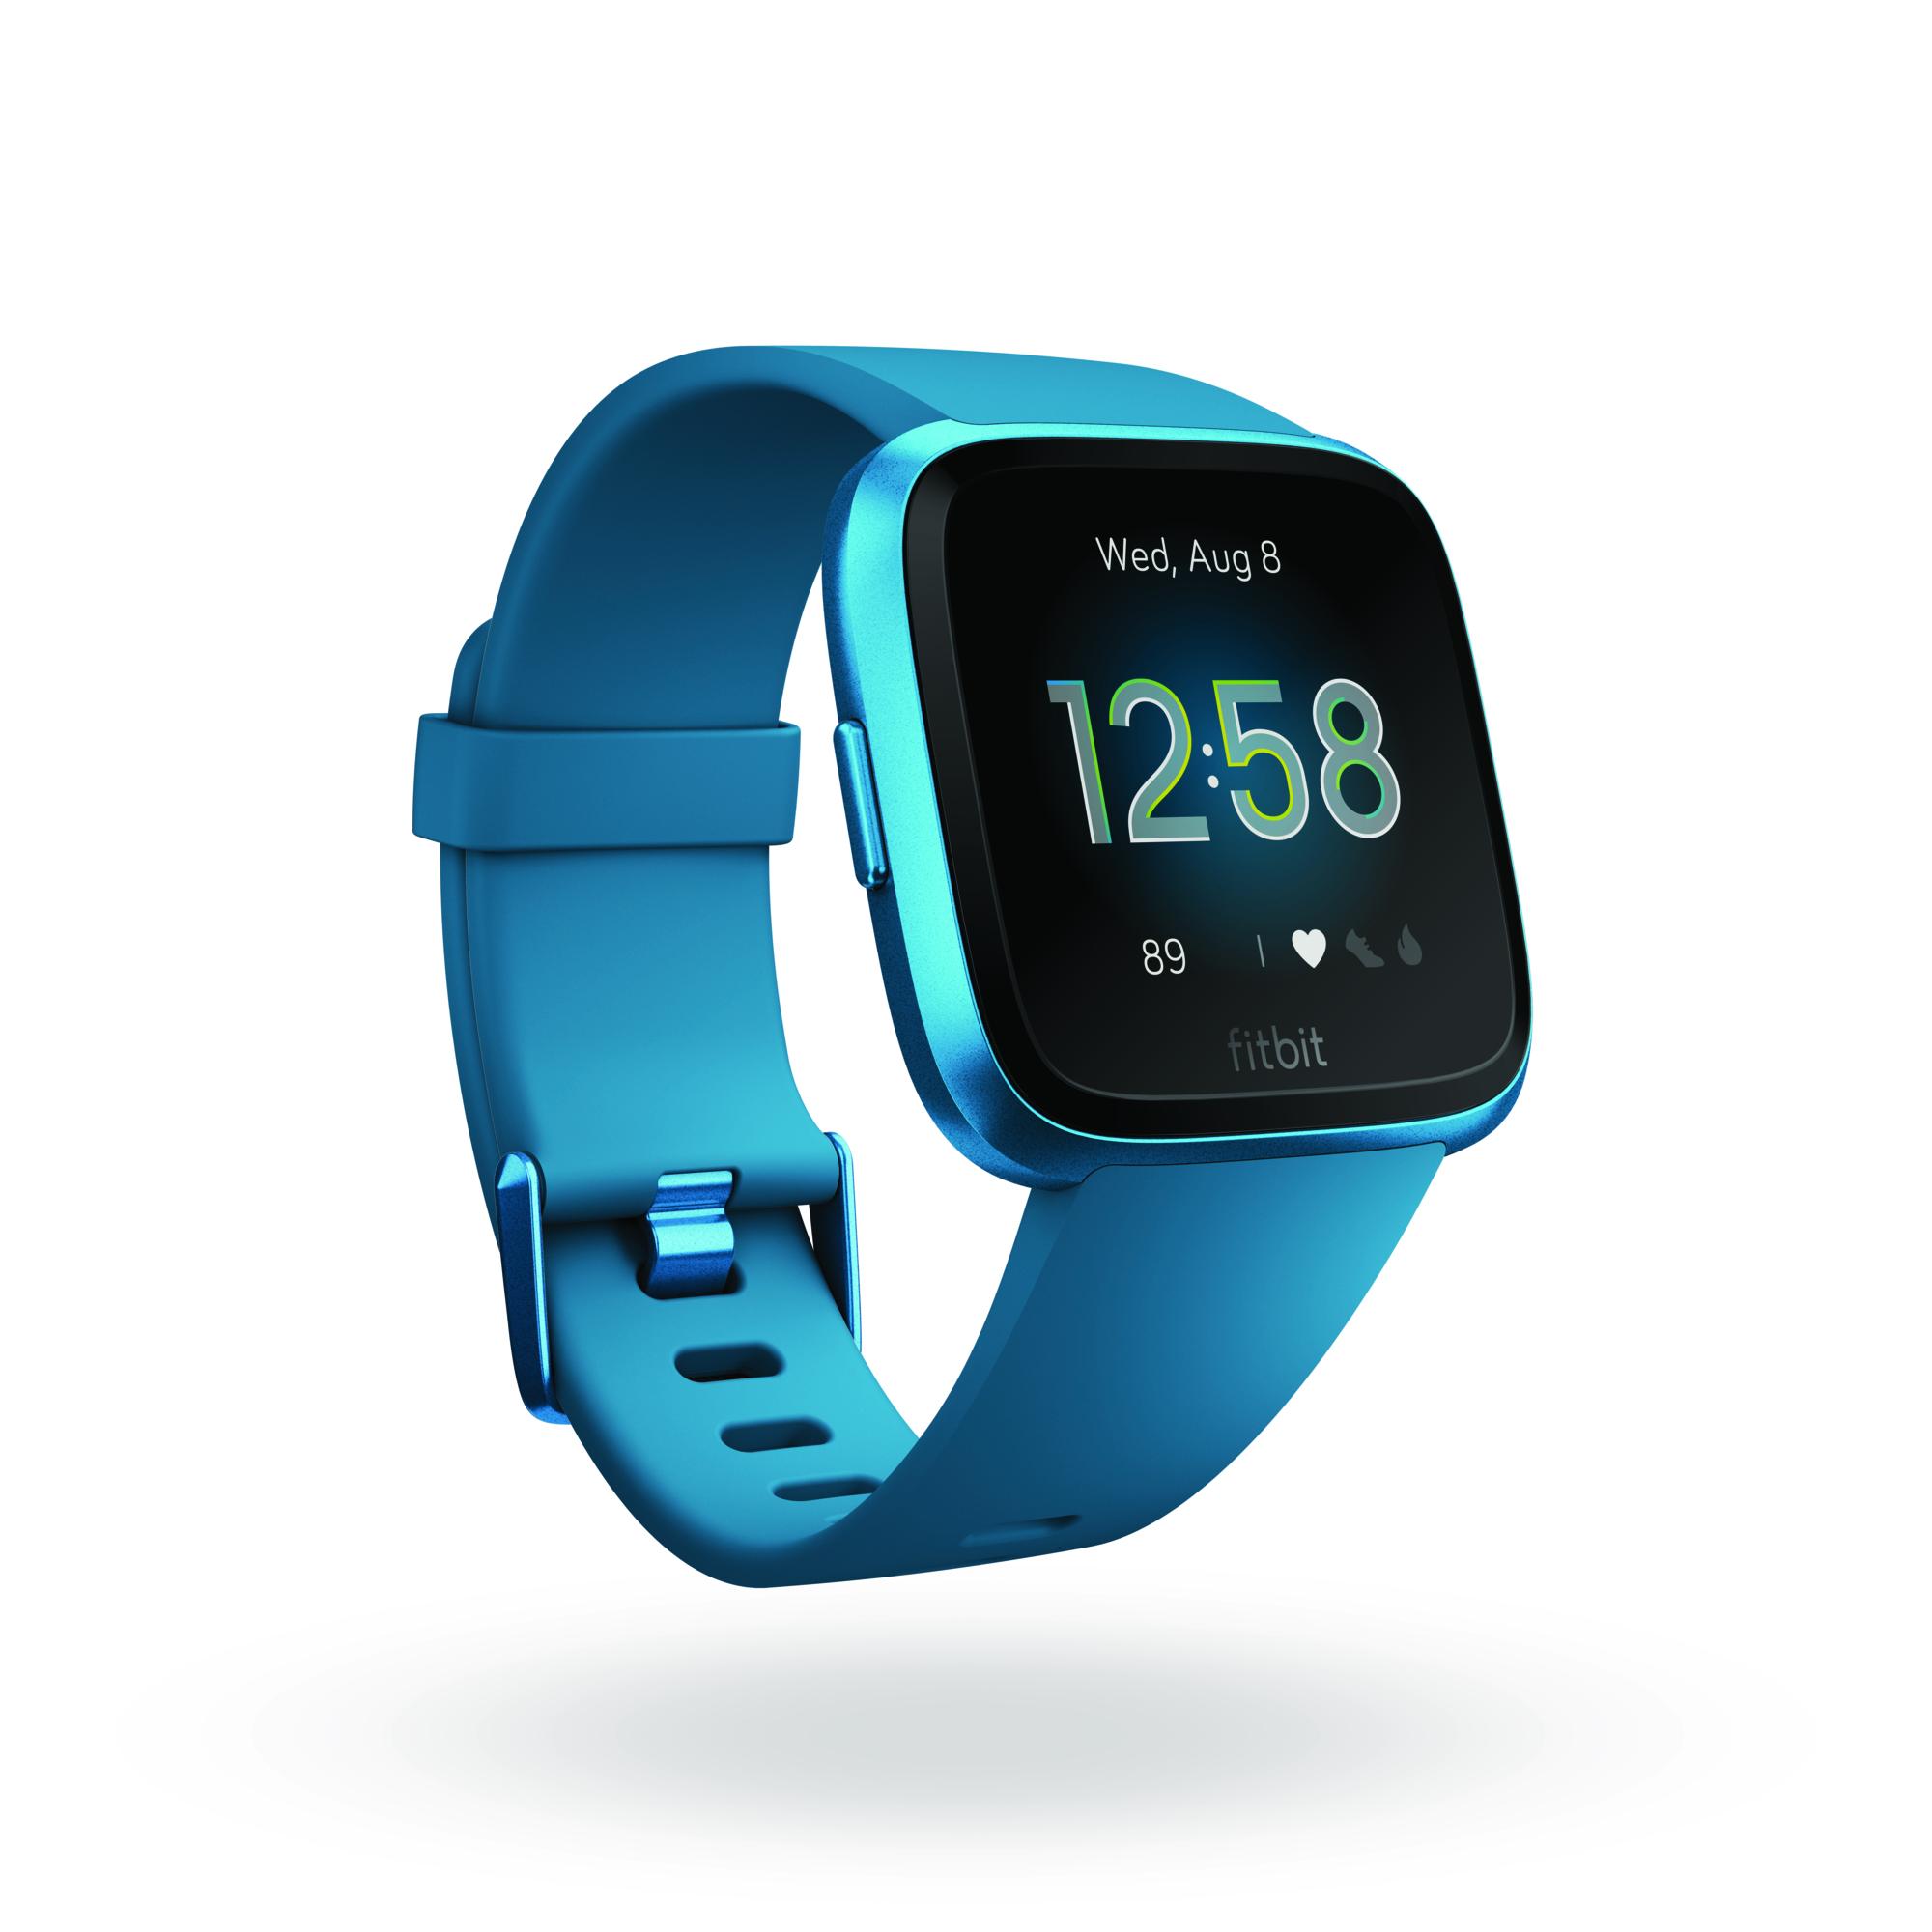 Smartwatch Per Bambini Carrefour